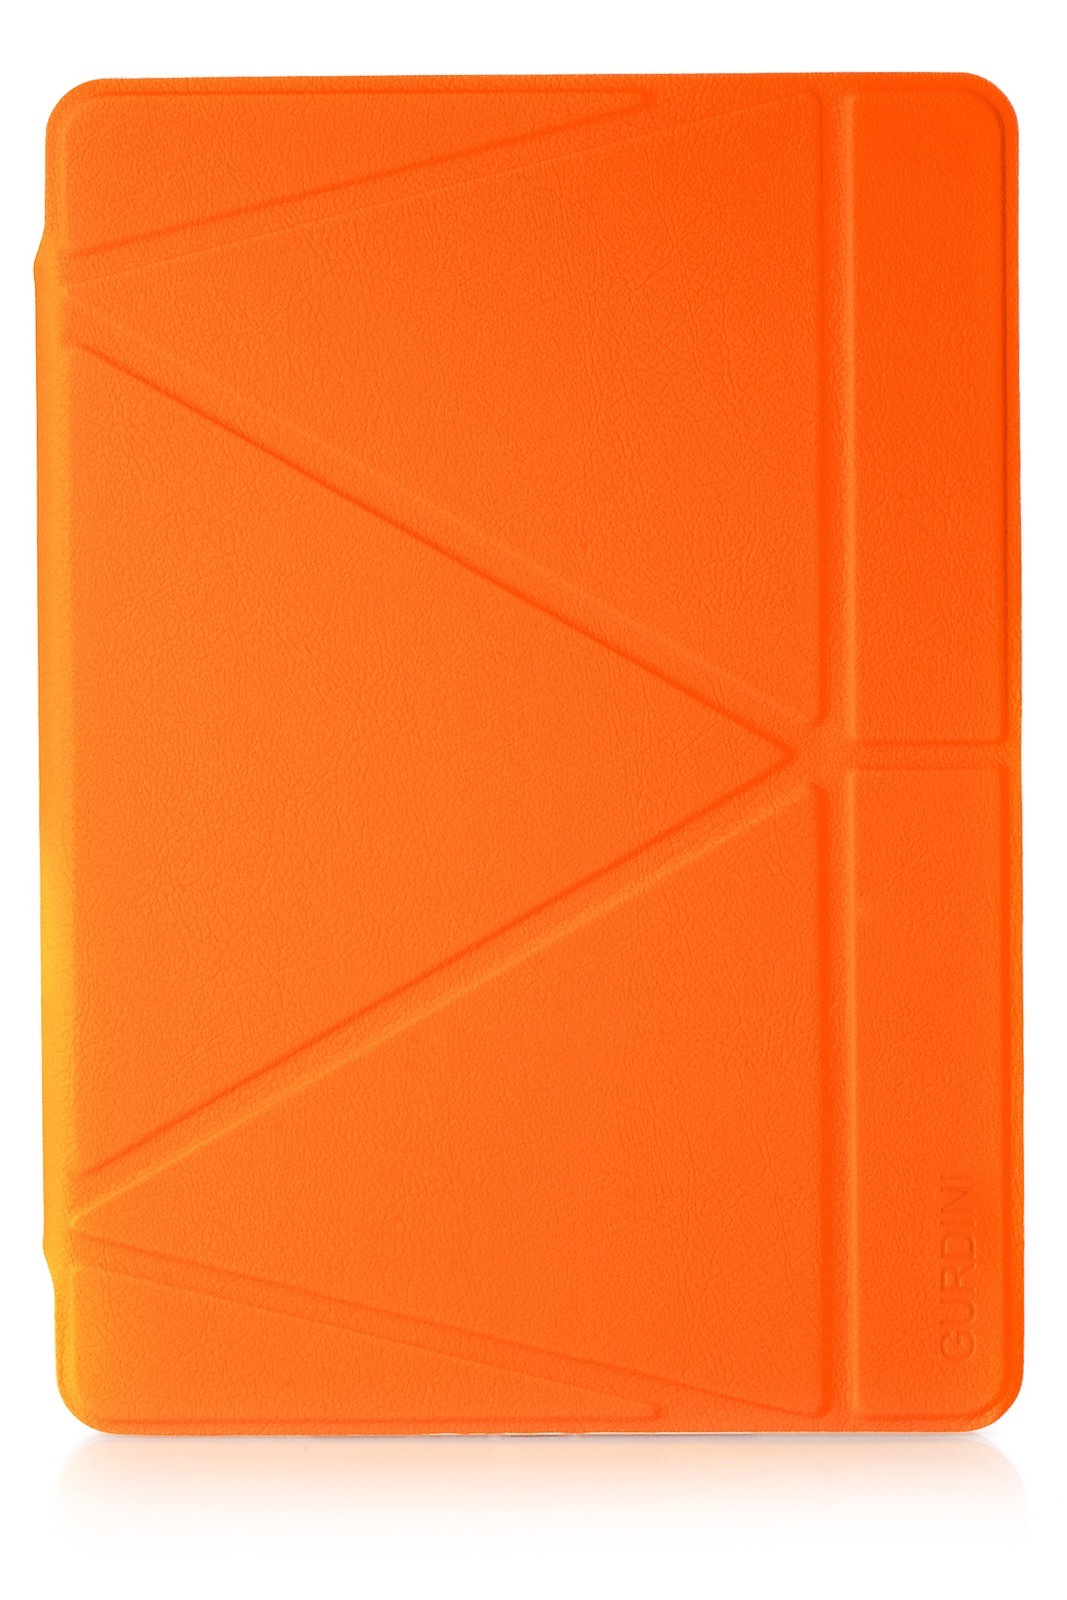 Чехол для планшета Gurdini Lights Series для Apple iPad Air 2, 660039, оранжевый